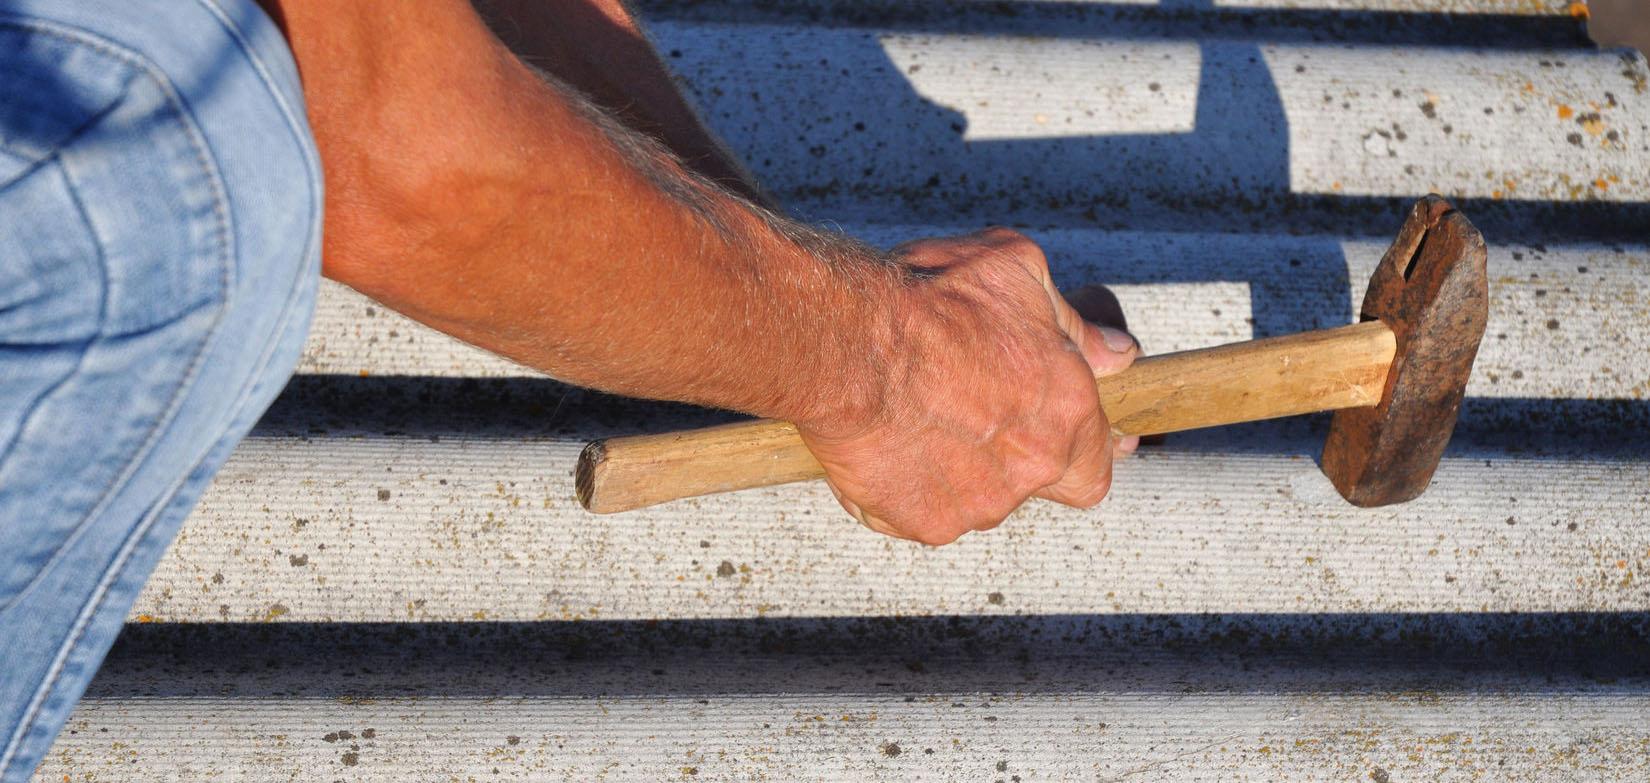 Asbestosis – What is it? - Asbestos Abatement Services